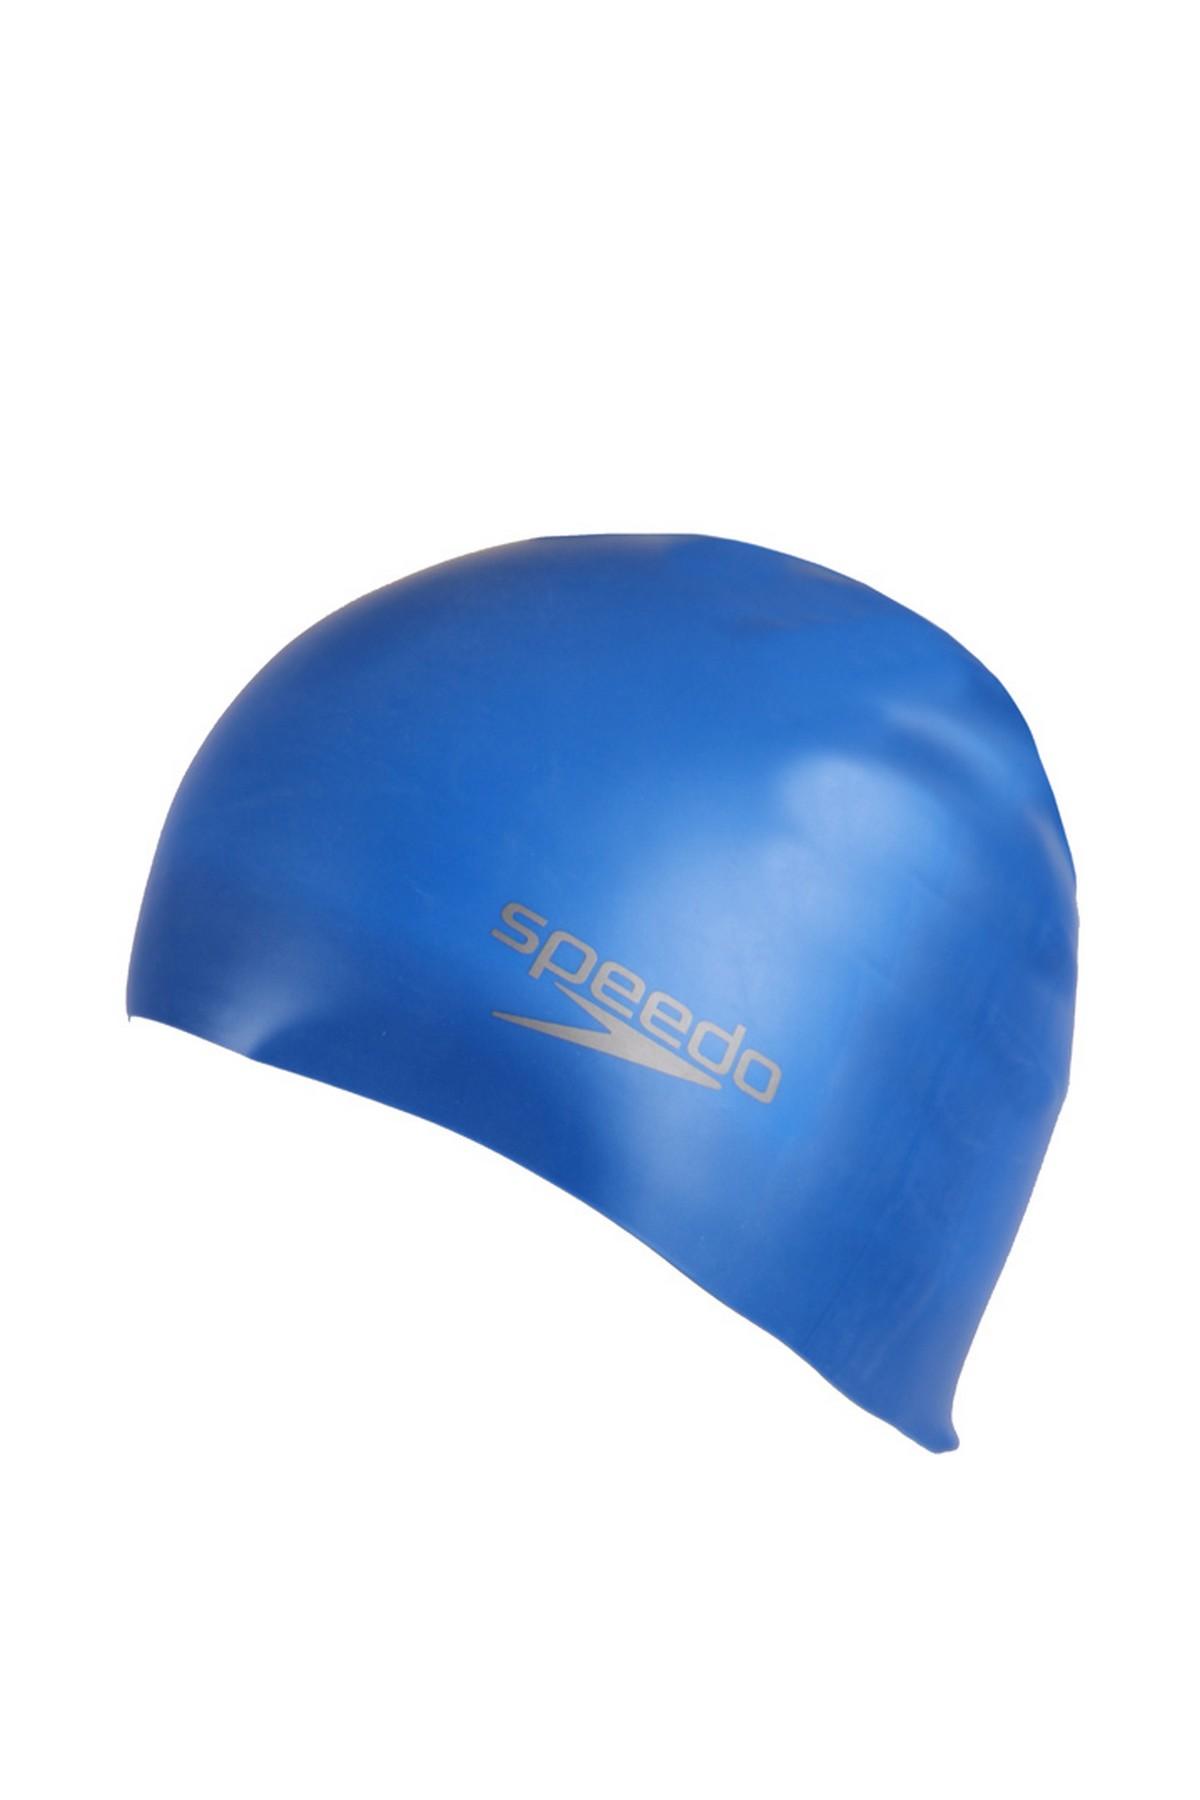 Speedo 8-709842610